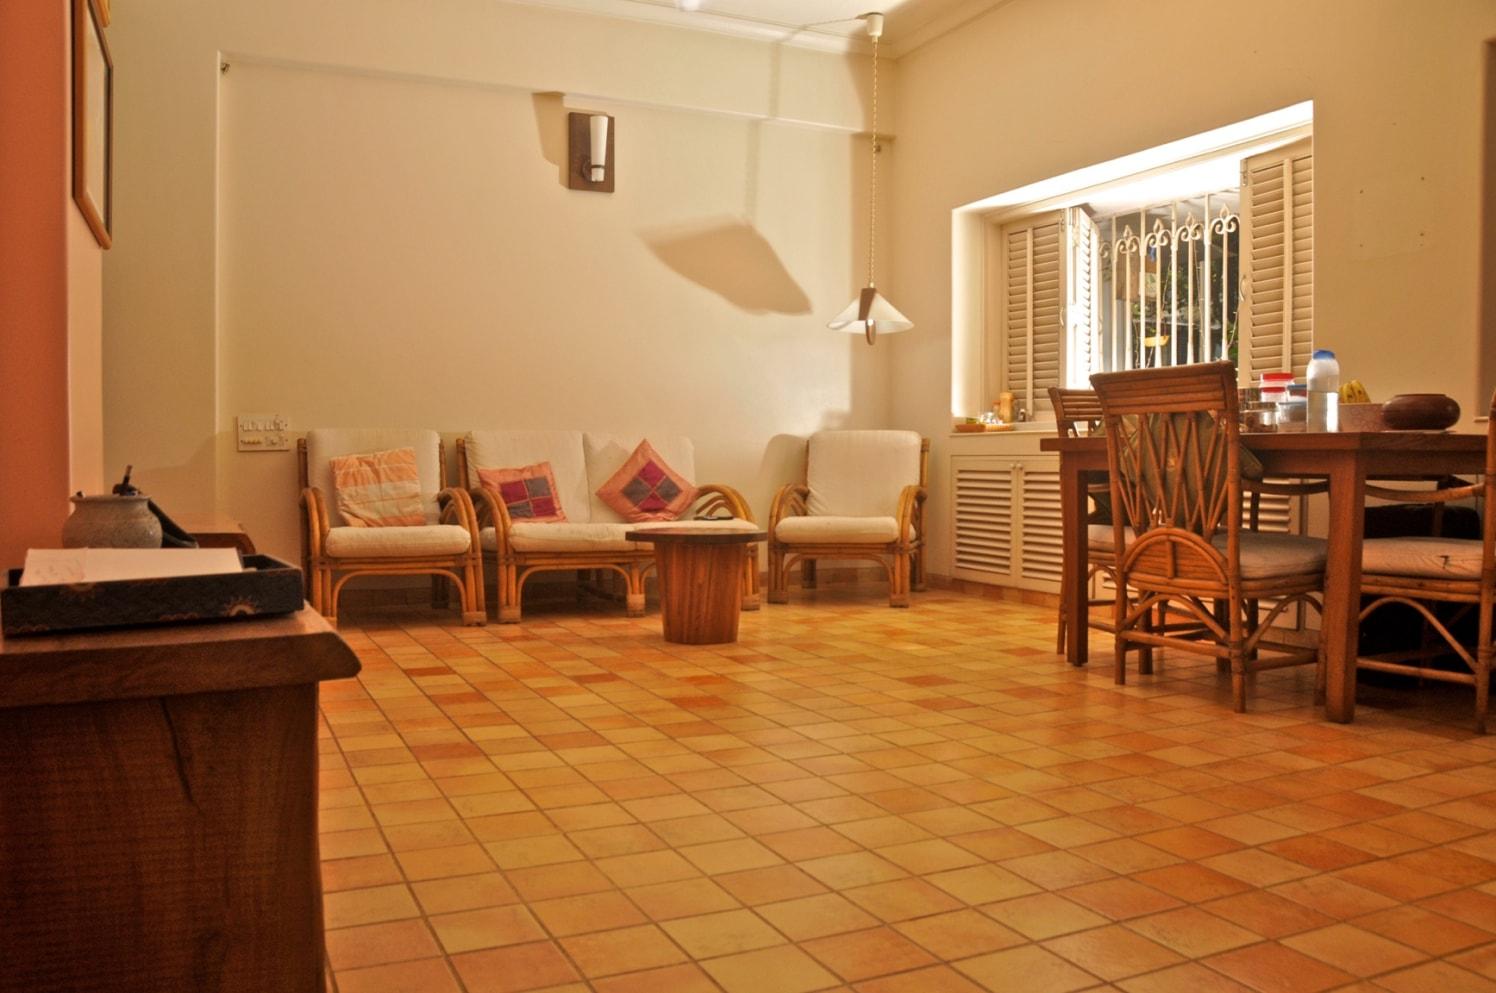 Wooden Themed Living Room with Tiled FLooring by Viraf Laskari  Living-room Contemporary | Interior Design Photos & Ideas